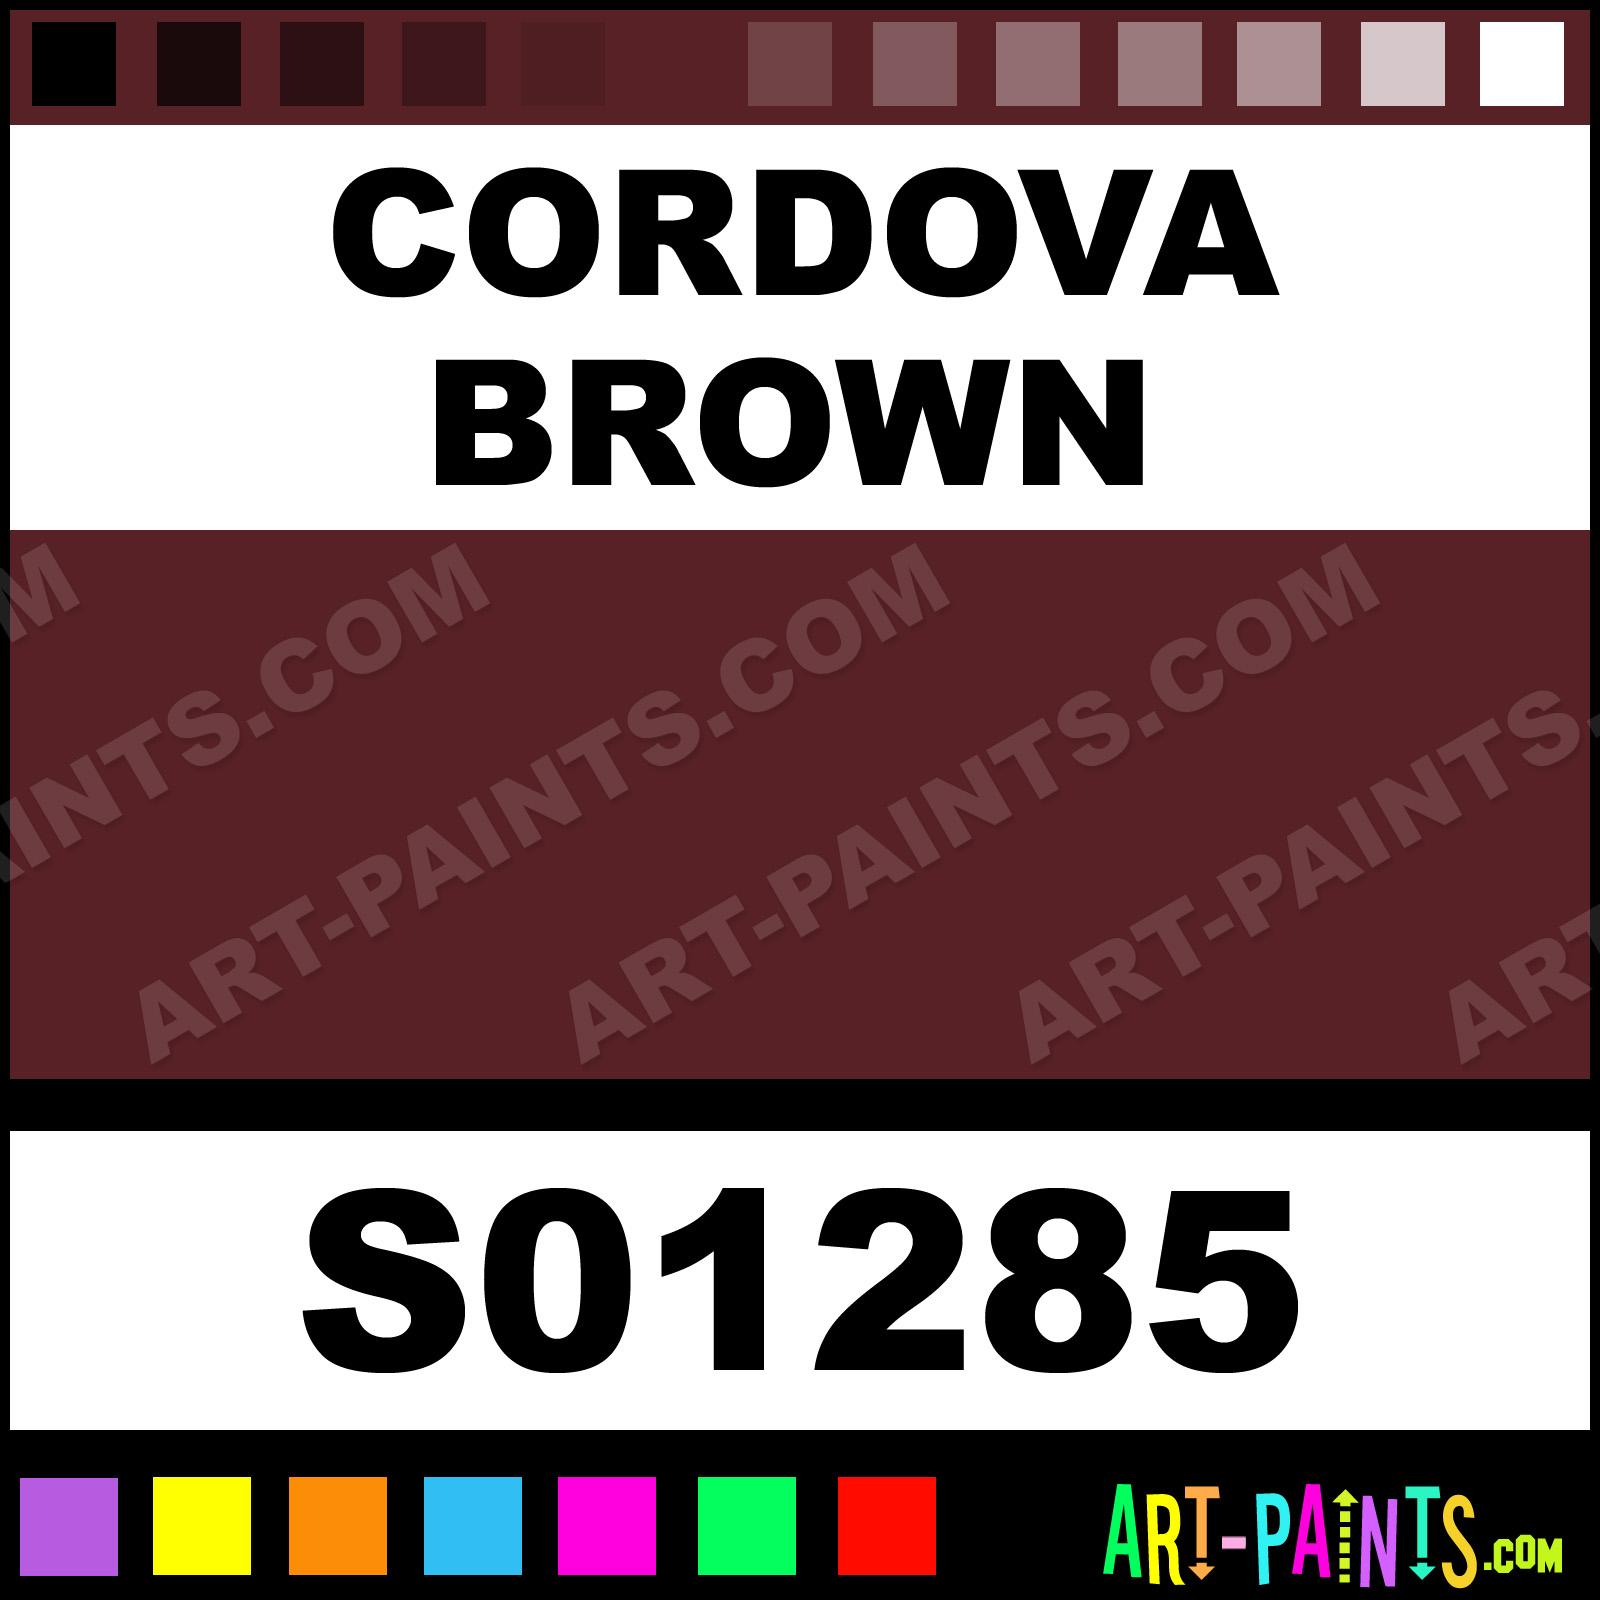 Cordova Brown Paint